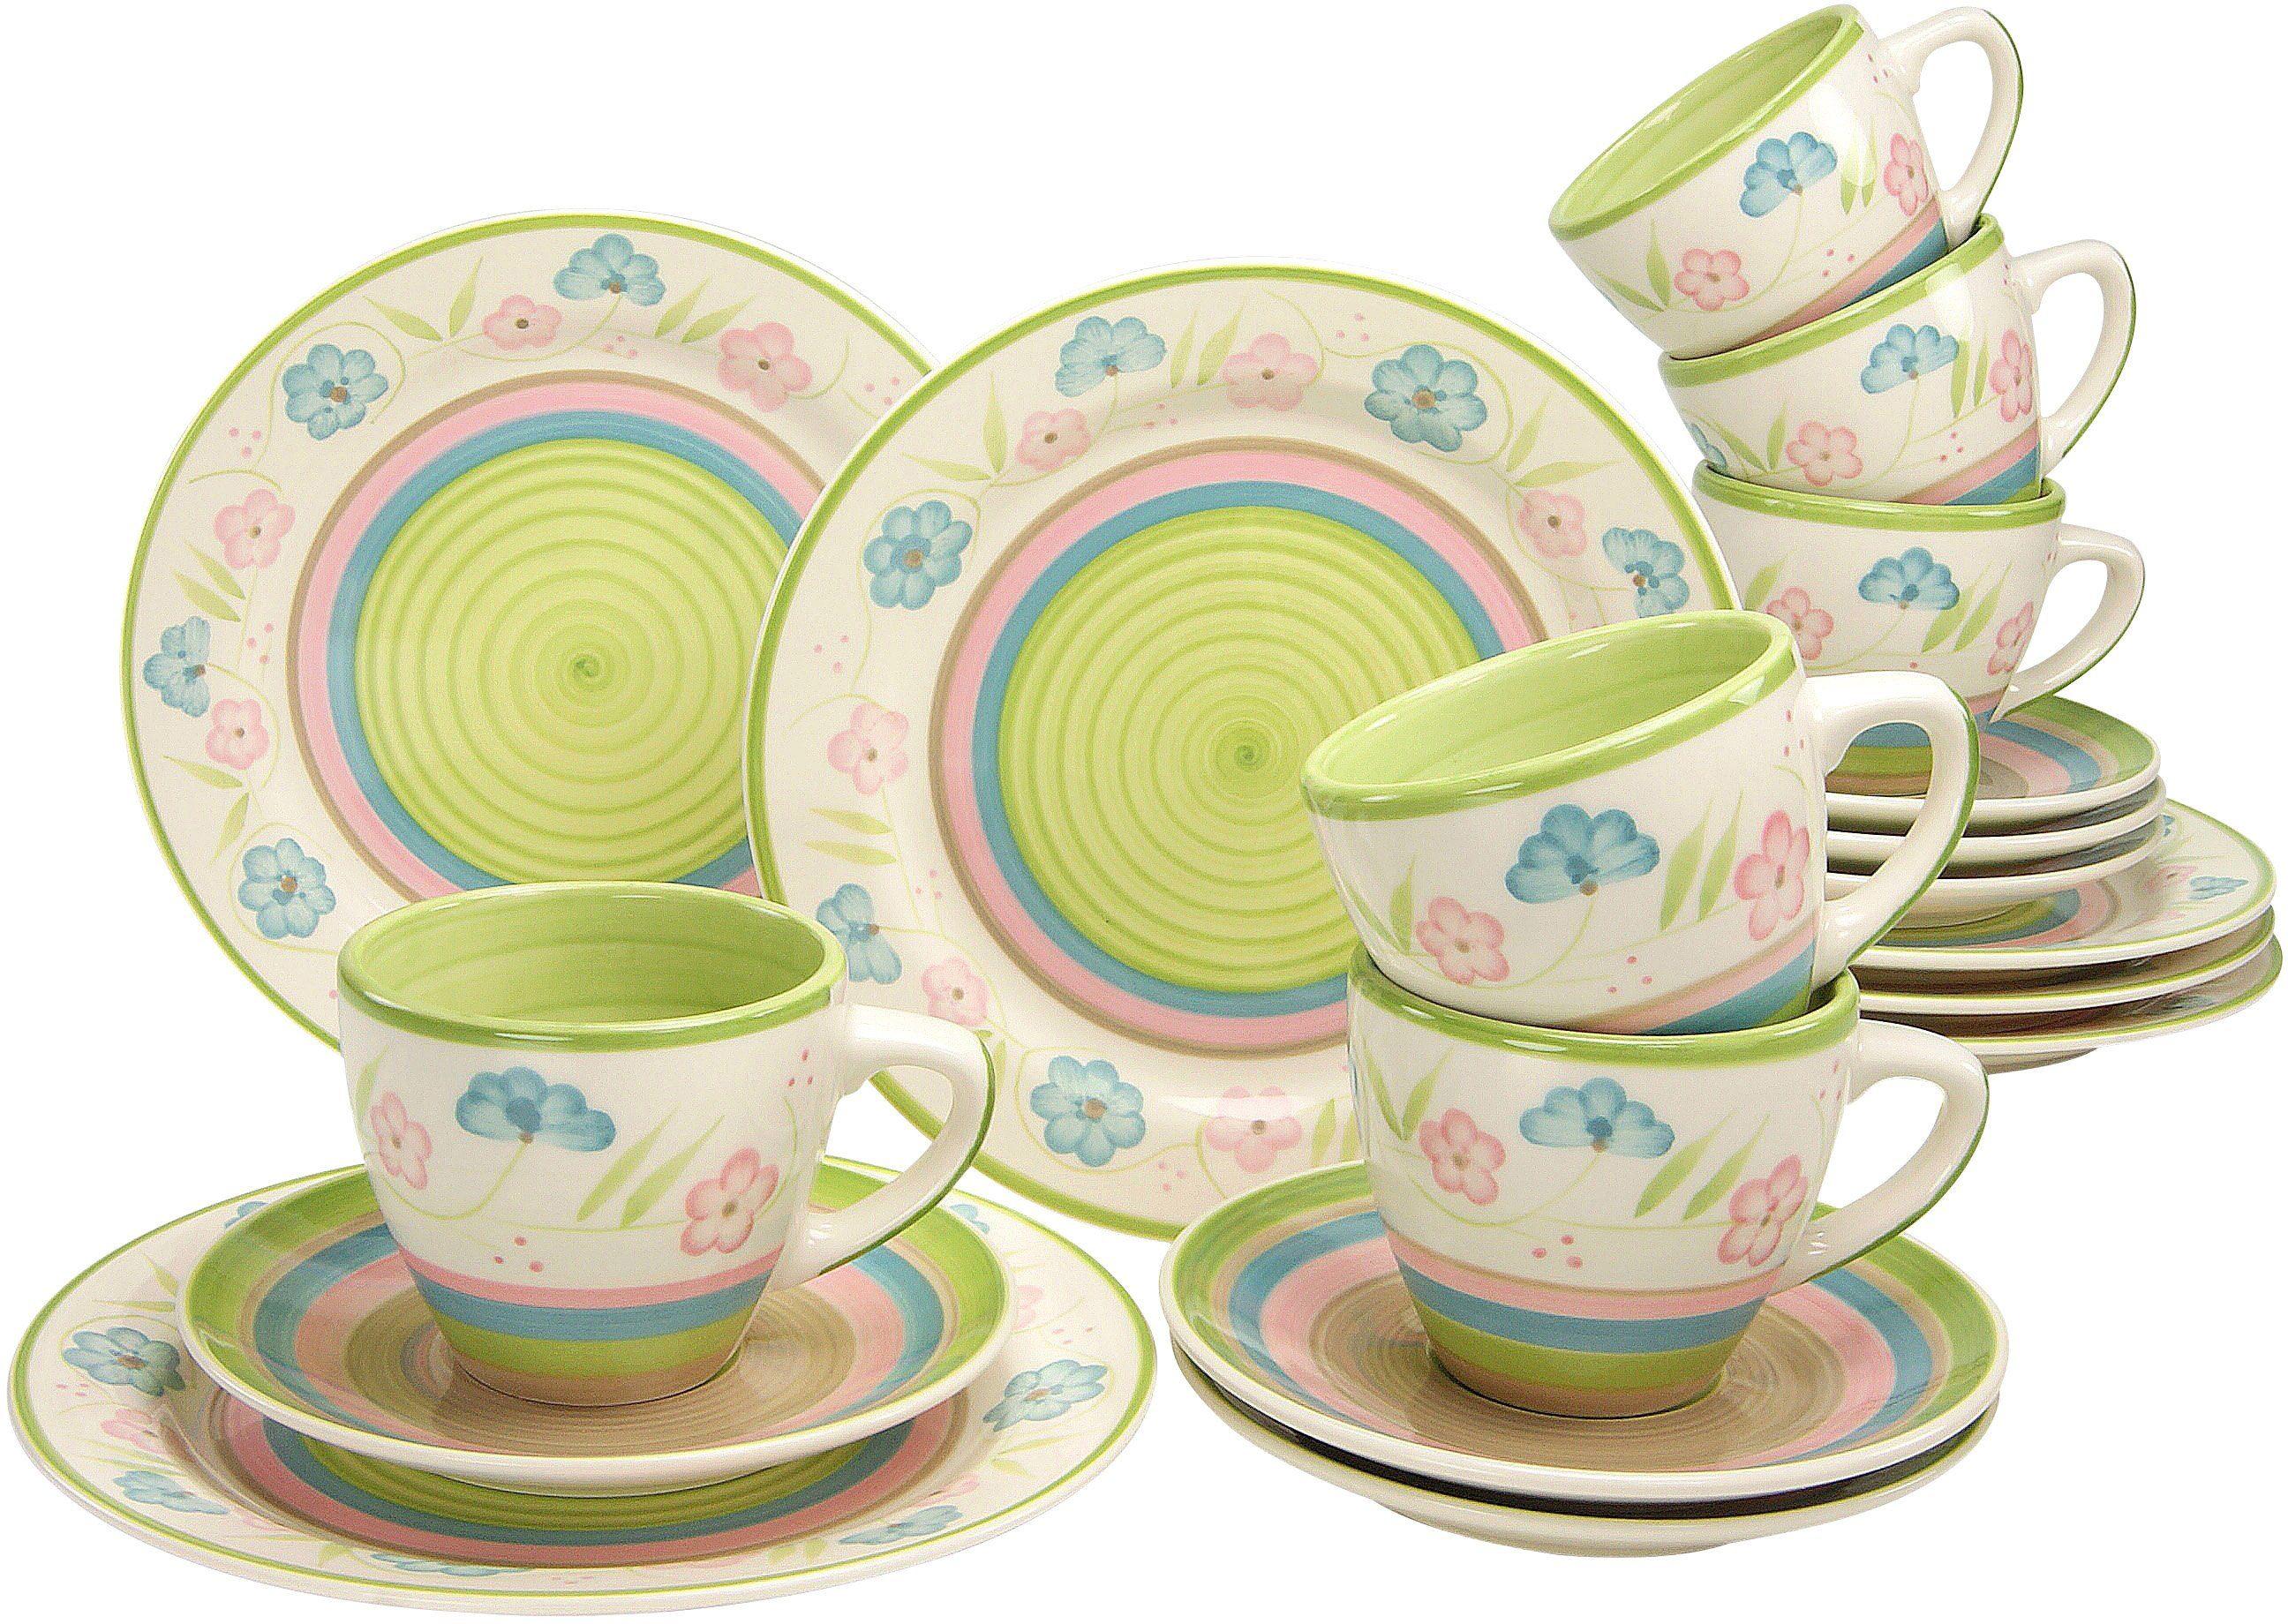 CreaTable Kaffeeservice, Steingut, 18 Teile, »Flower Serenade Pastell«